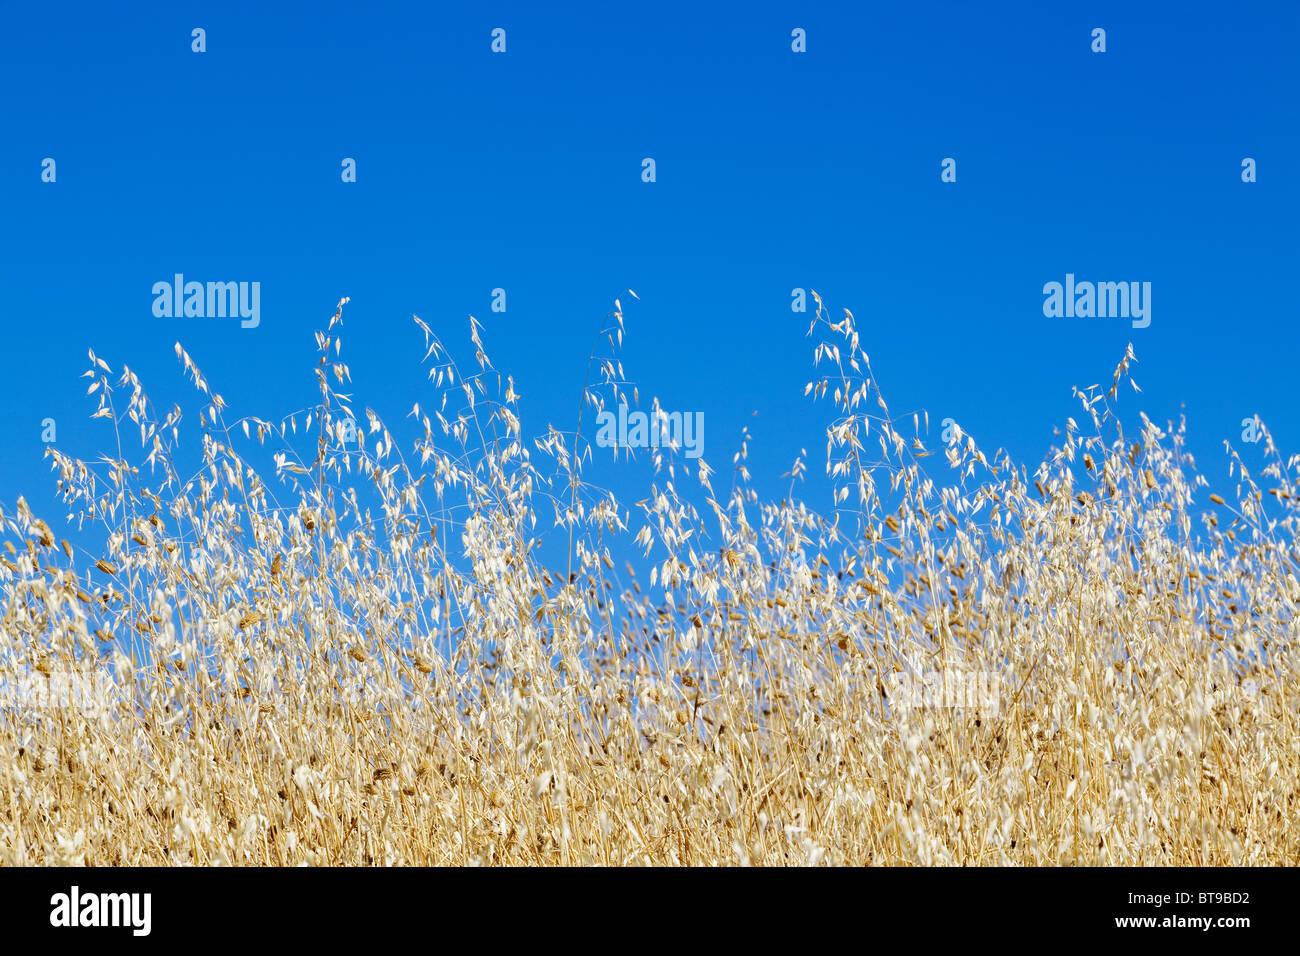 Giornate estive - cielo blu - Toscana, Italia, Immagini Stock